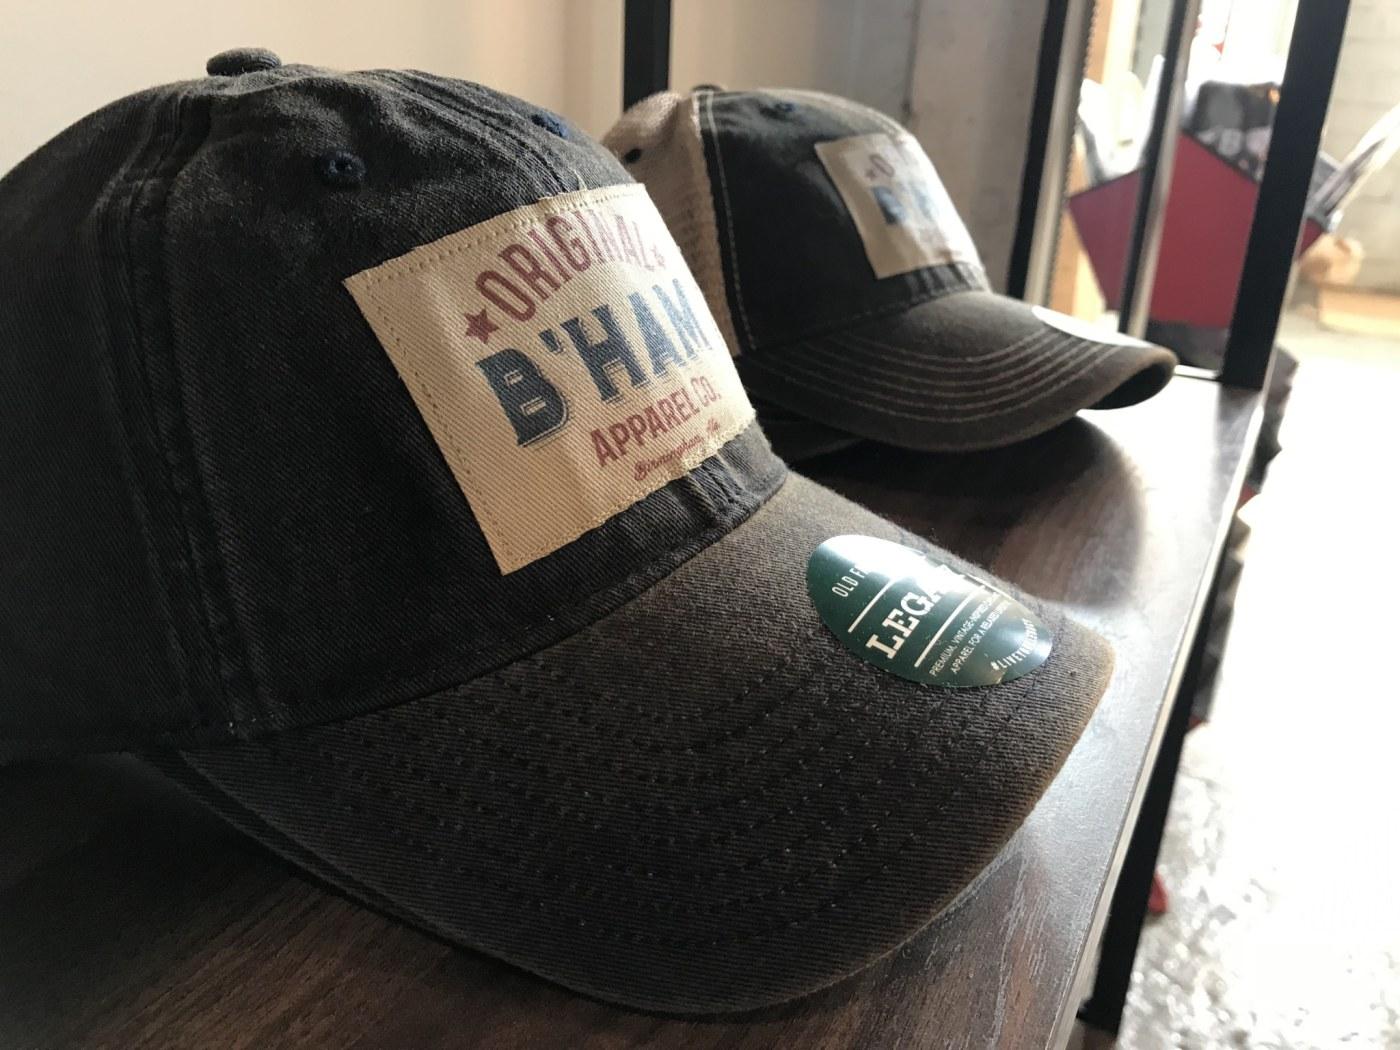 Birmingham, Alabama, Original Bham, The Battery, hats, baseball caps